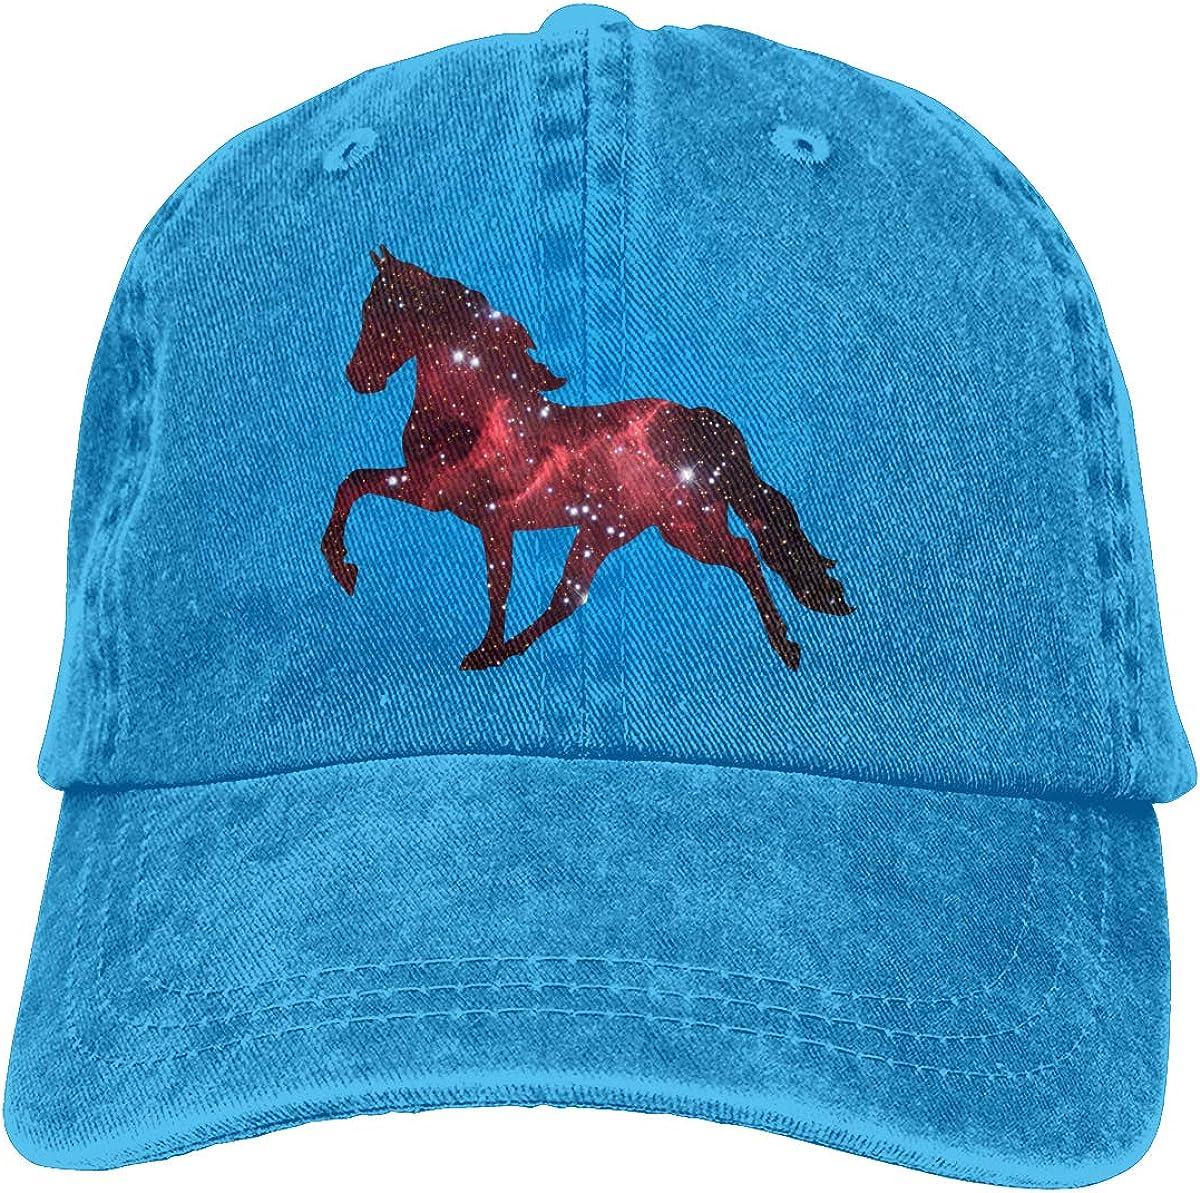 PMGM-C Walking Horse Adult Trendy Denim Casquette Adjustable Baseball Cap